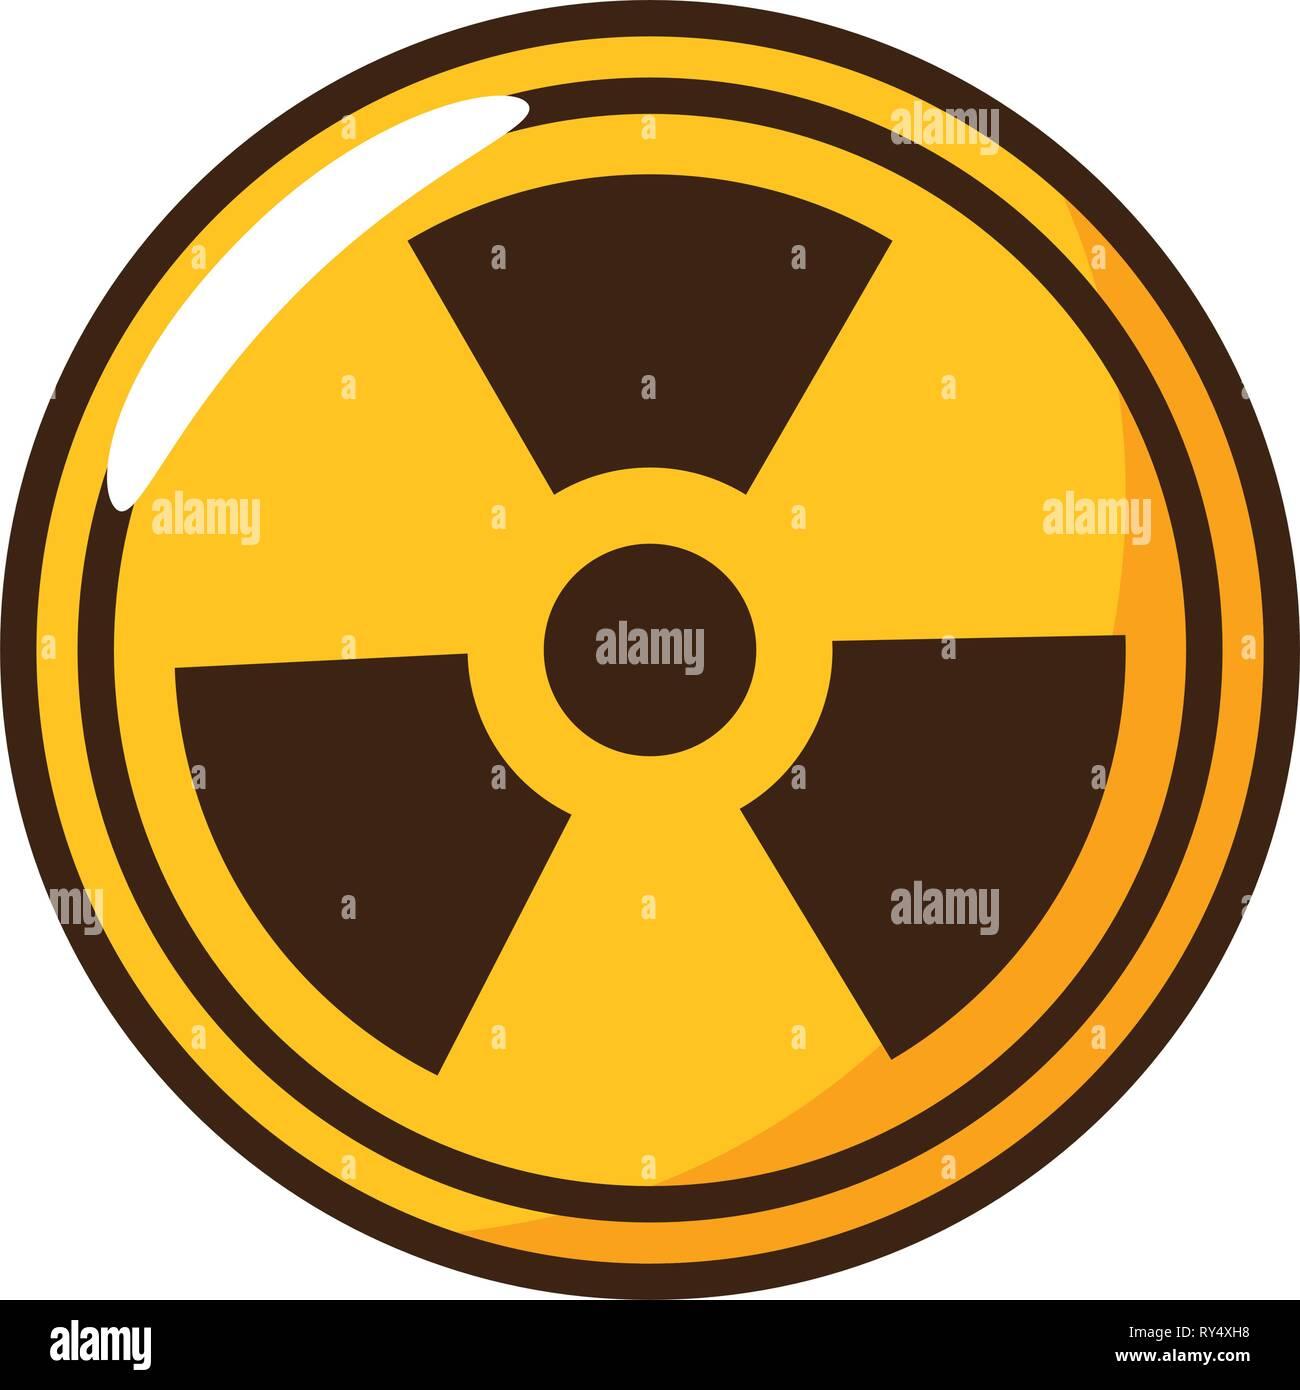 radiation symbol science Stock Vector